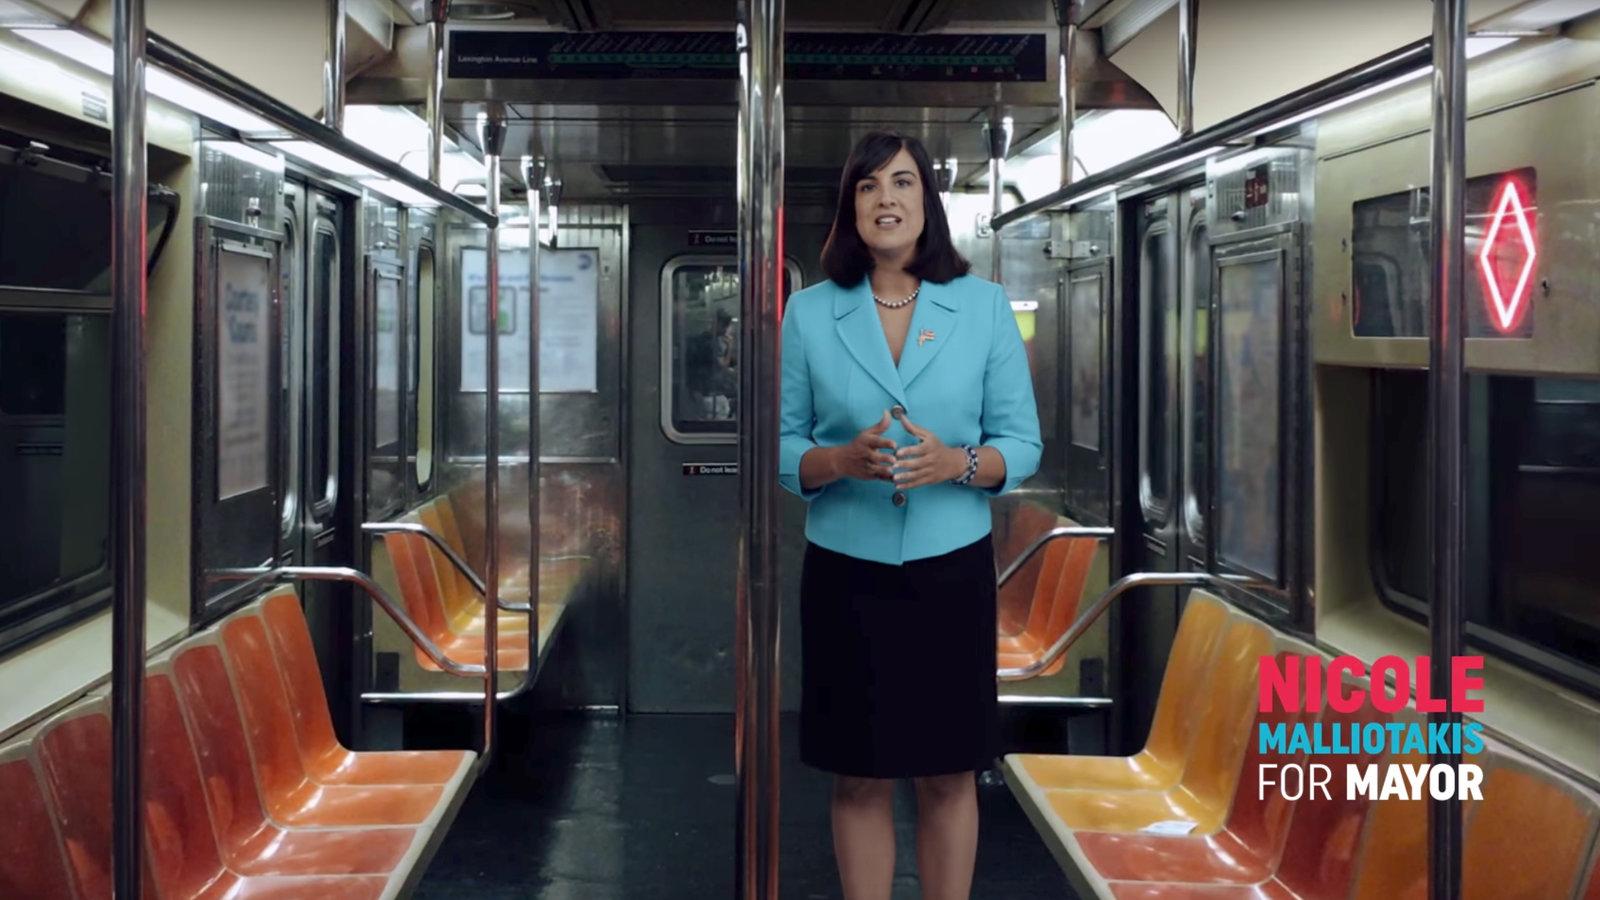 In Ad Malliotakis Takes Swing At De Blasio Over Subway